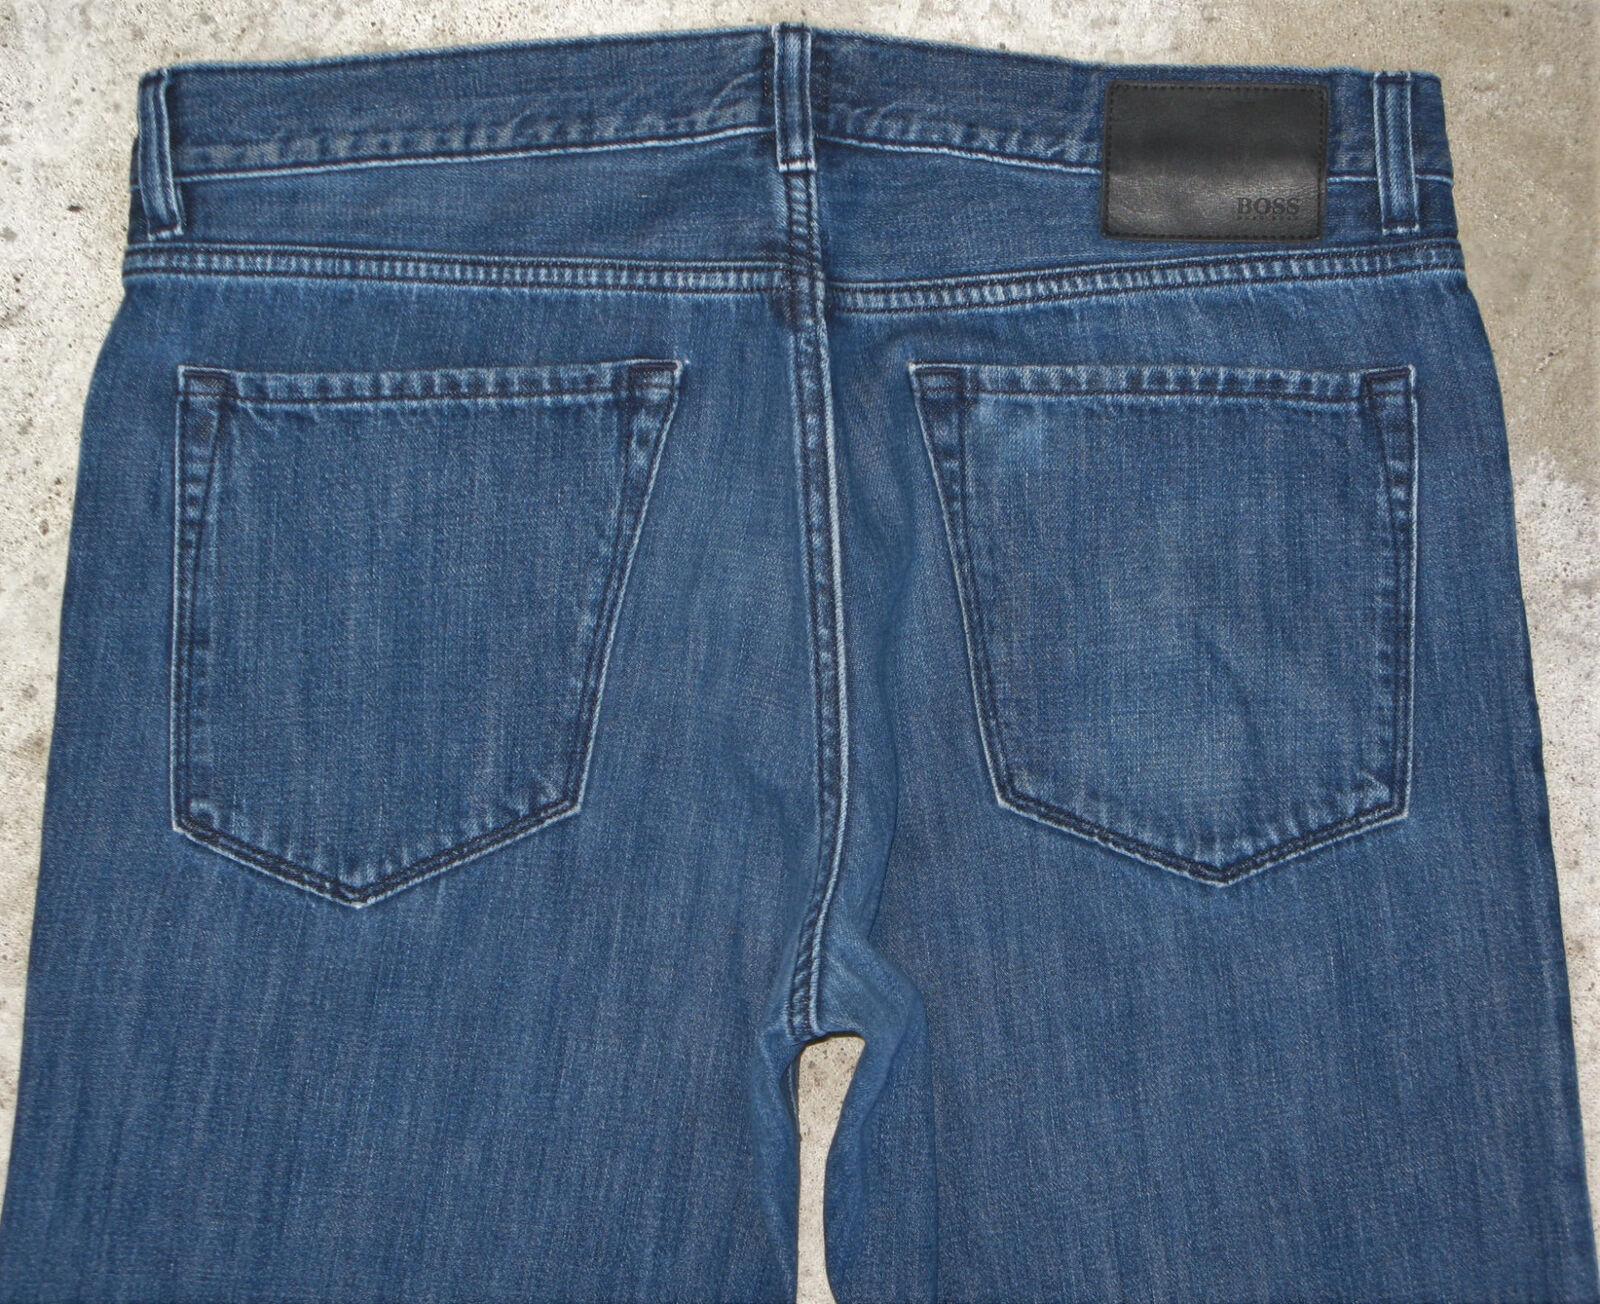 Hugo Boss Maine Jeans Mens Sz 36 X 33 Slim Straight Leg Distressed